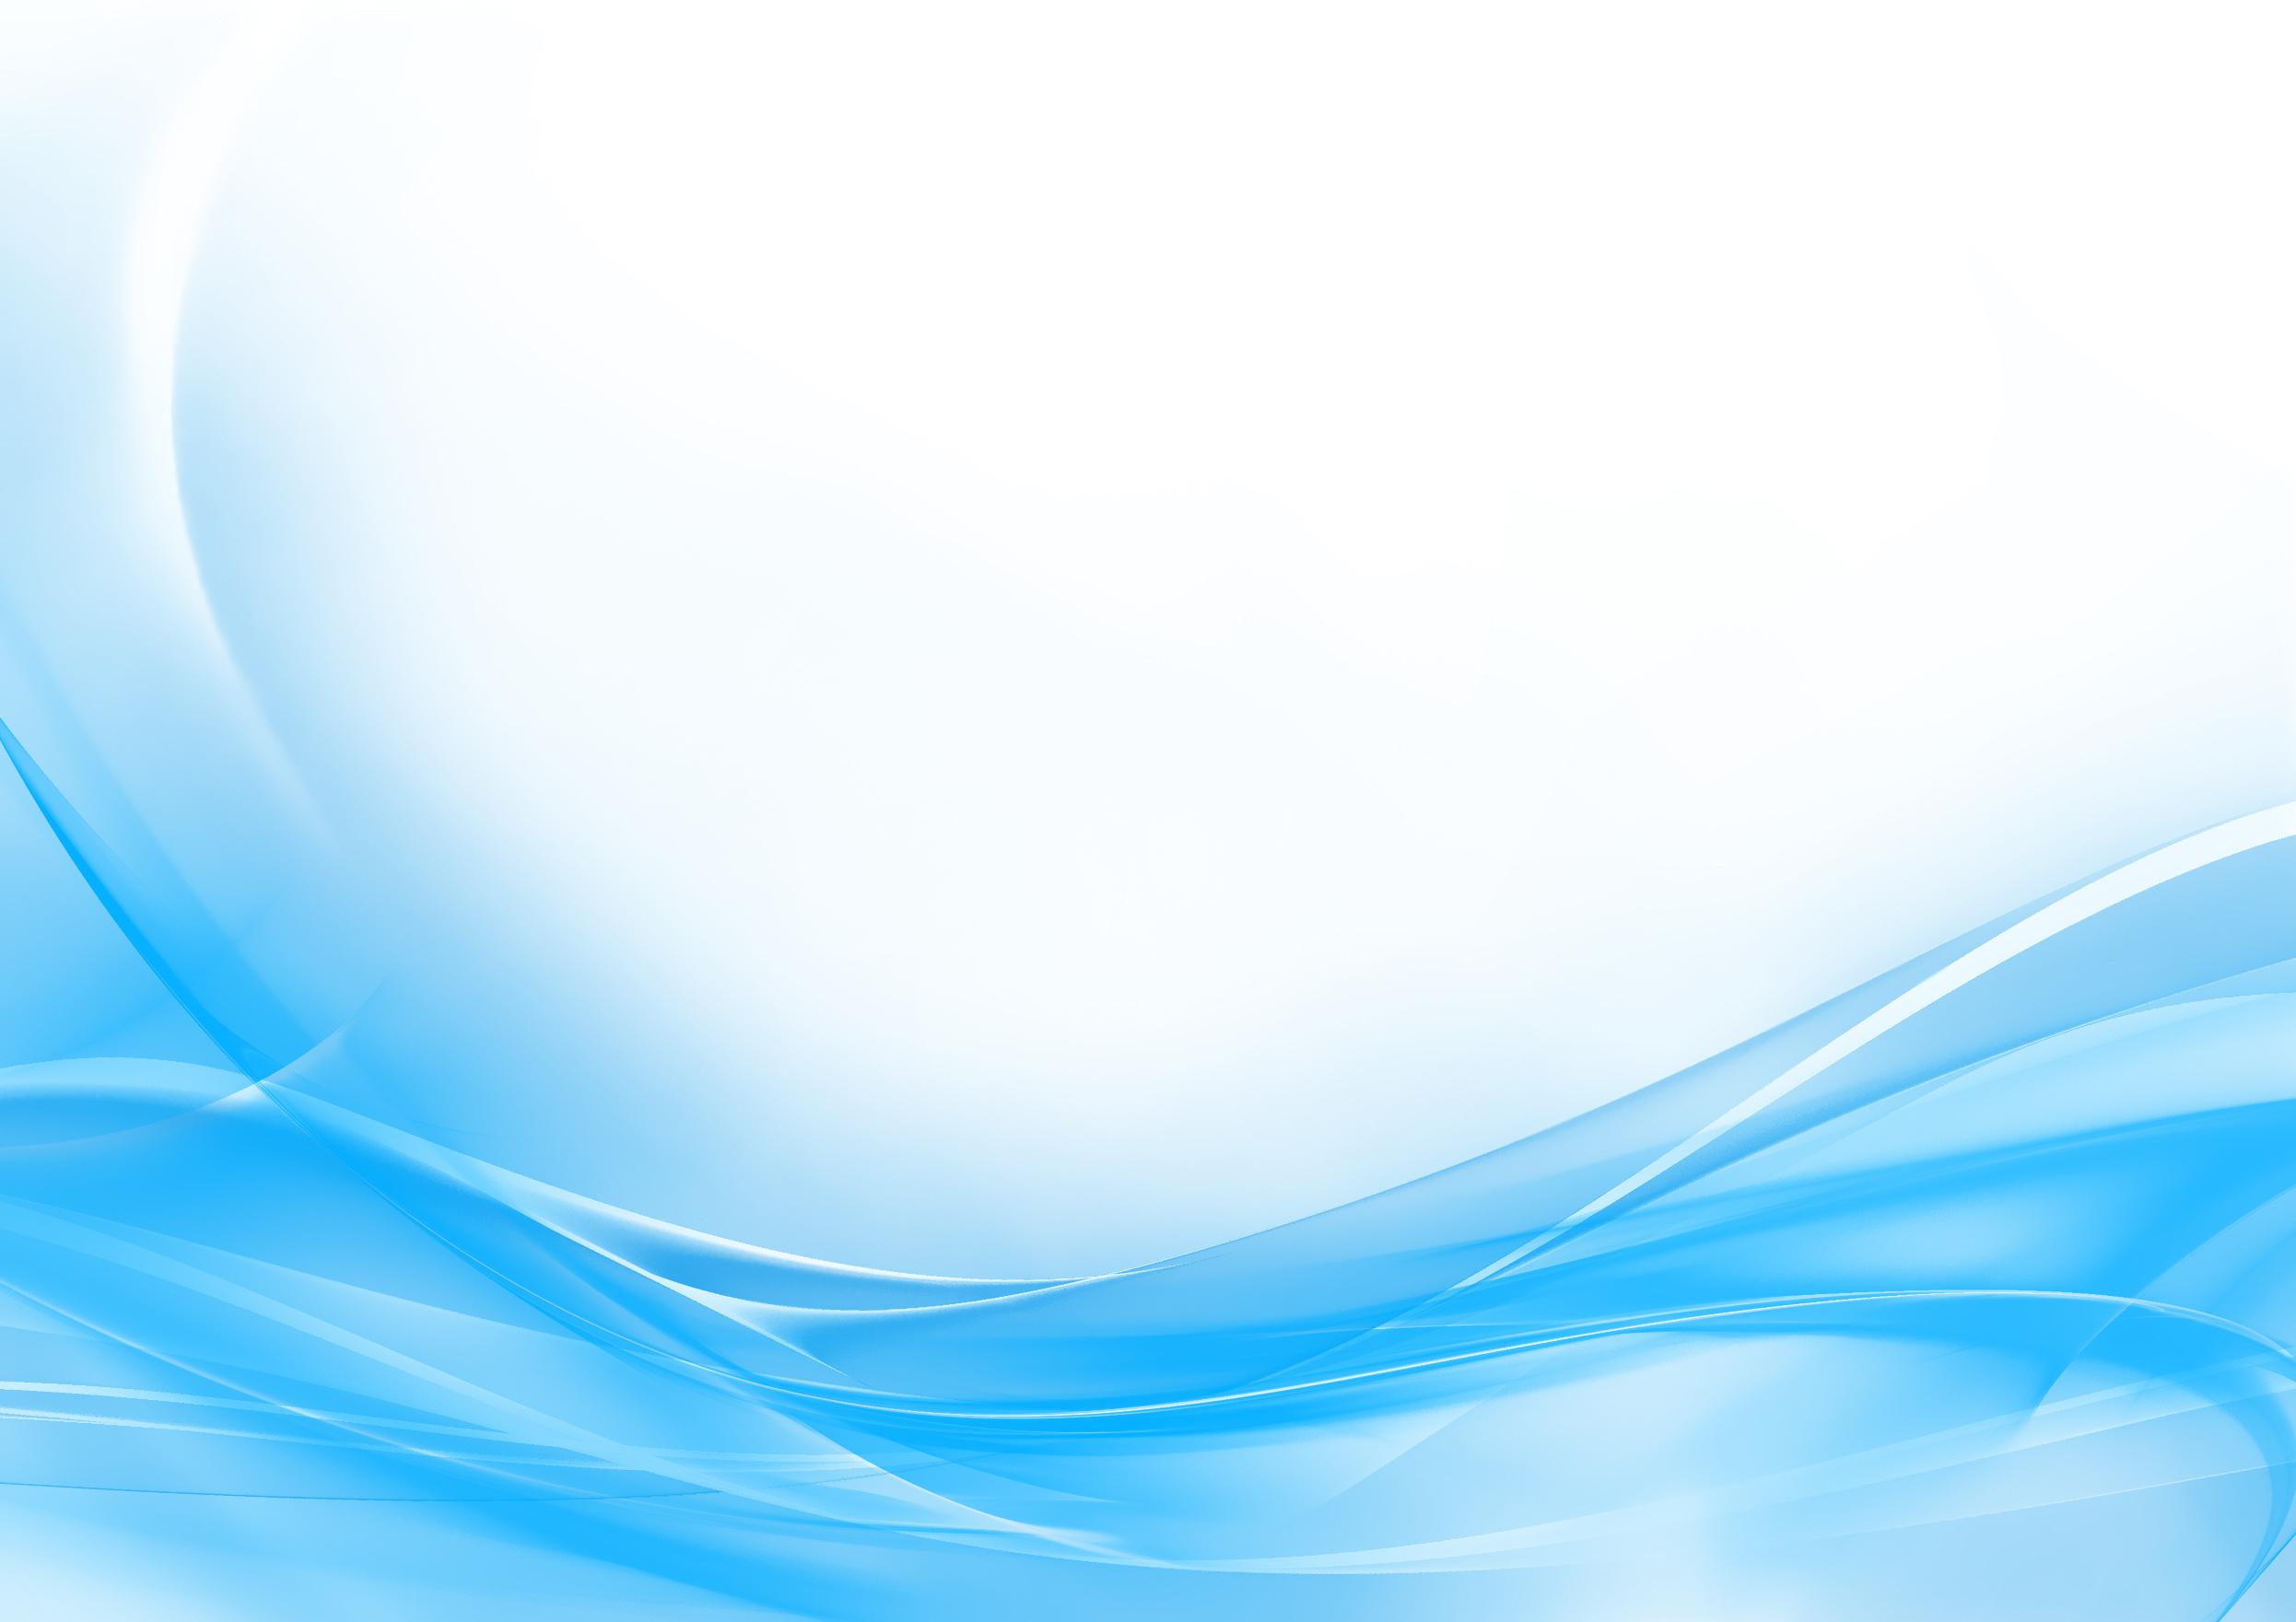 Background Jpg Hypnosis Weekly